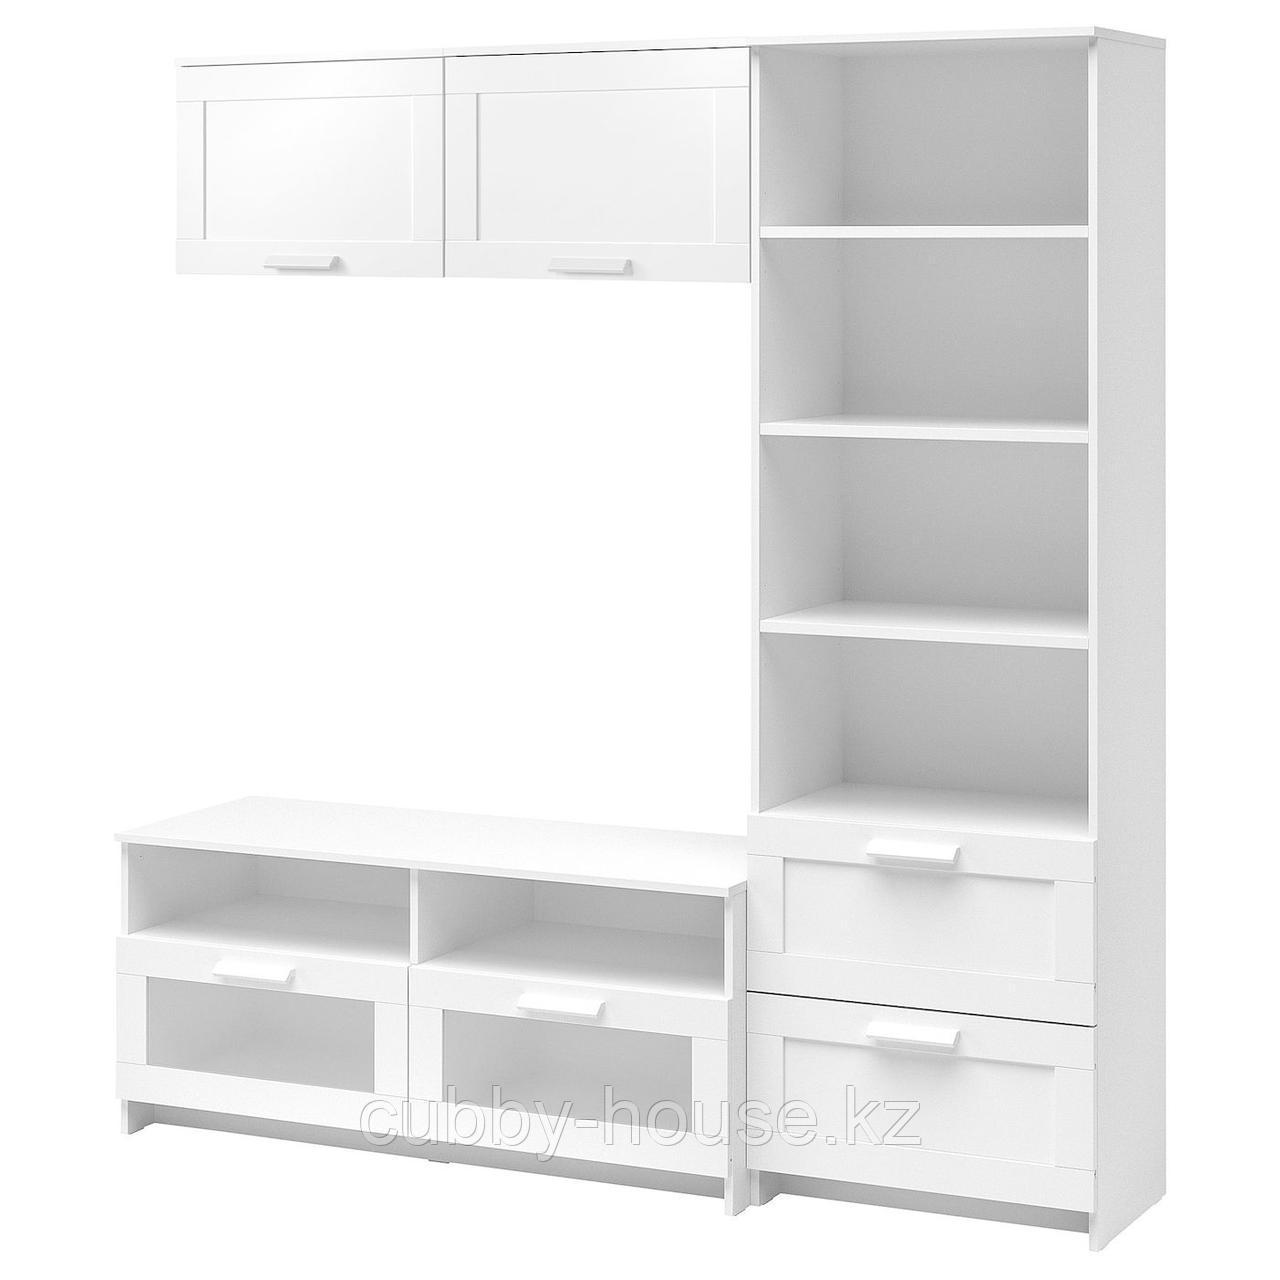 БРИМНЭС Шкаф для ТВ, комбинация, (белый, чёрный) 180x41x190 см